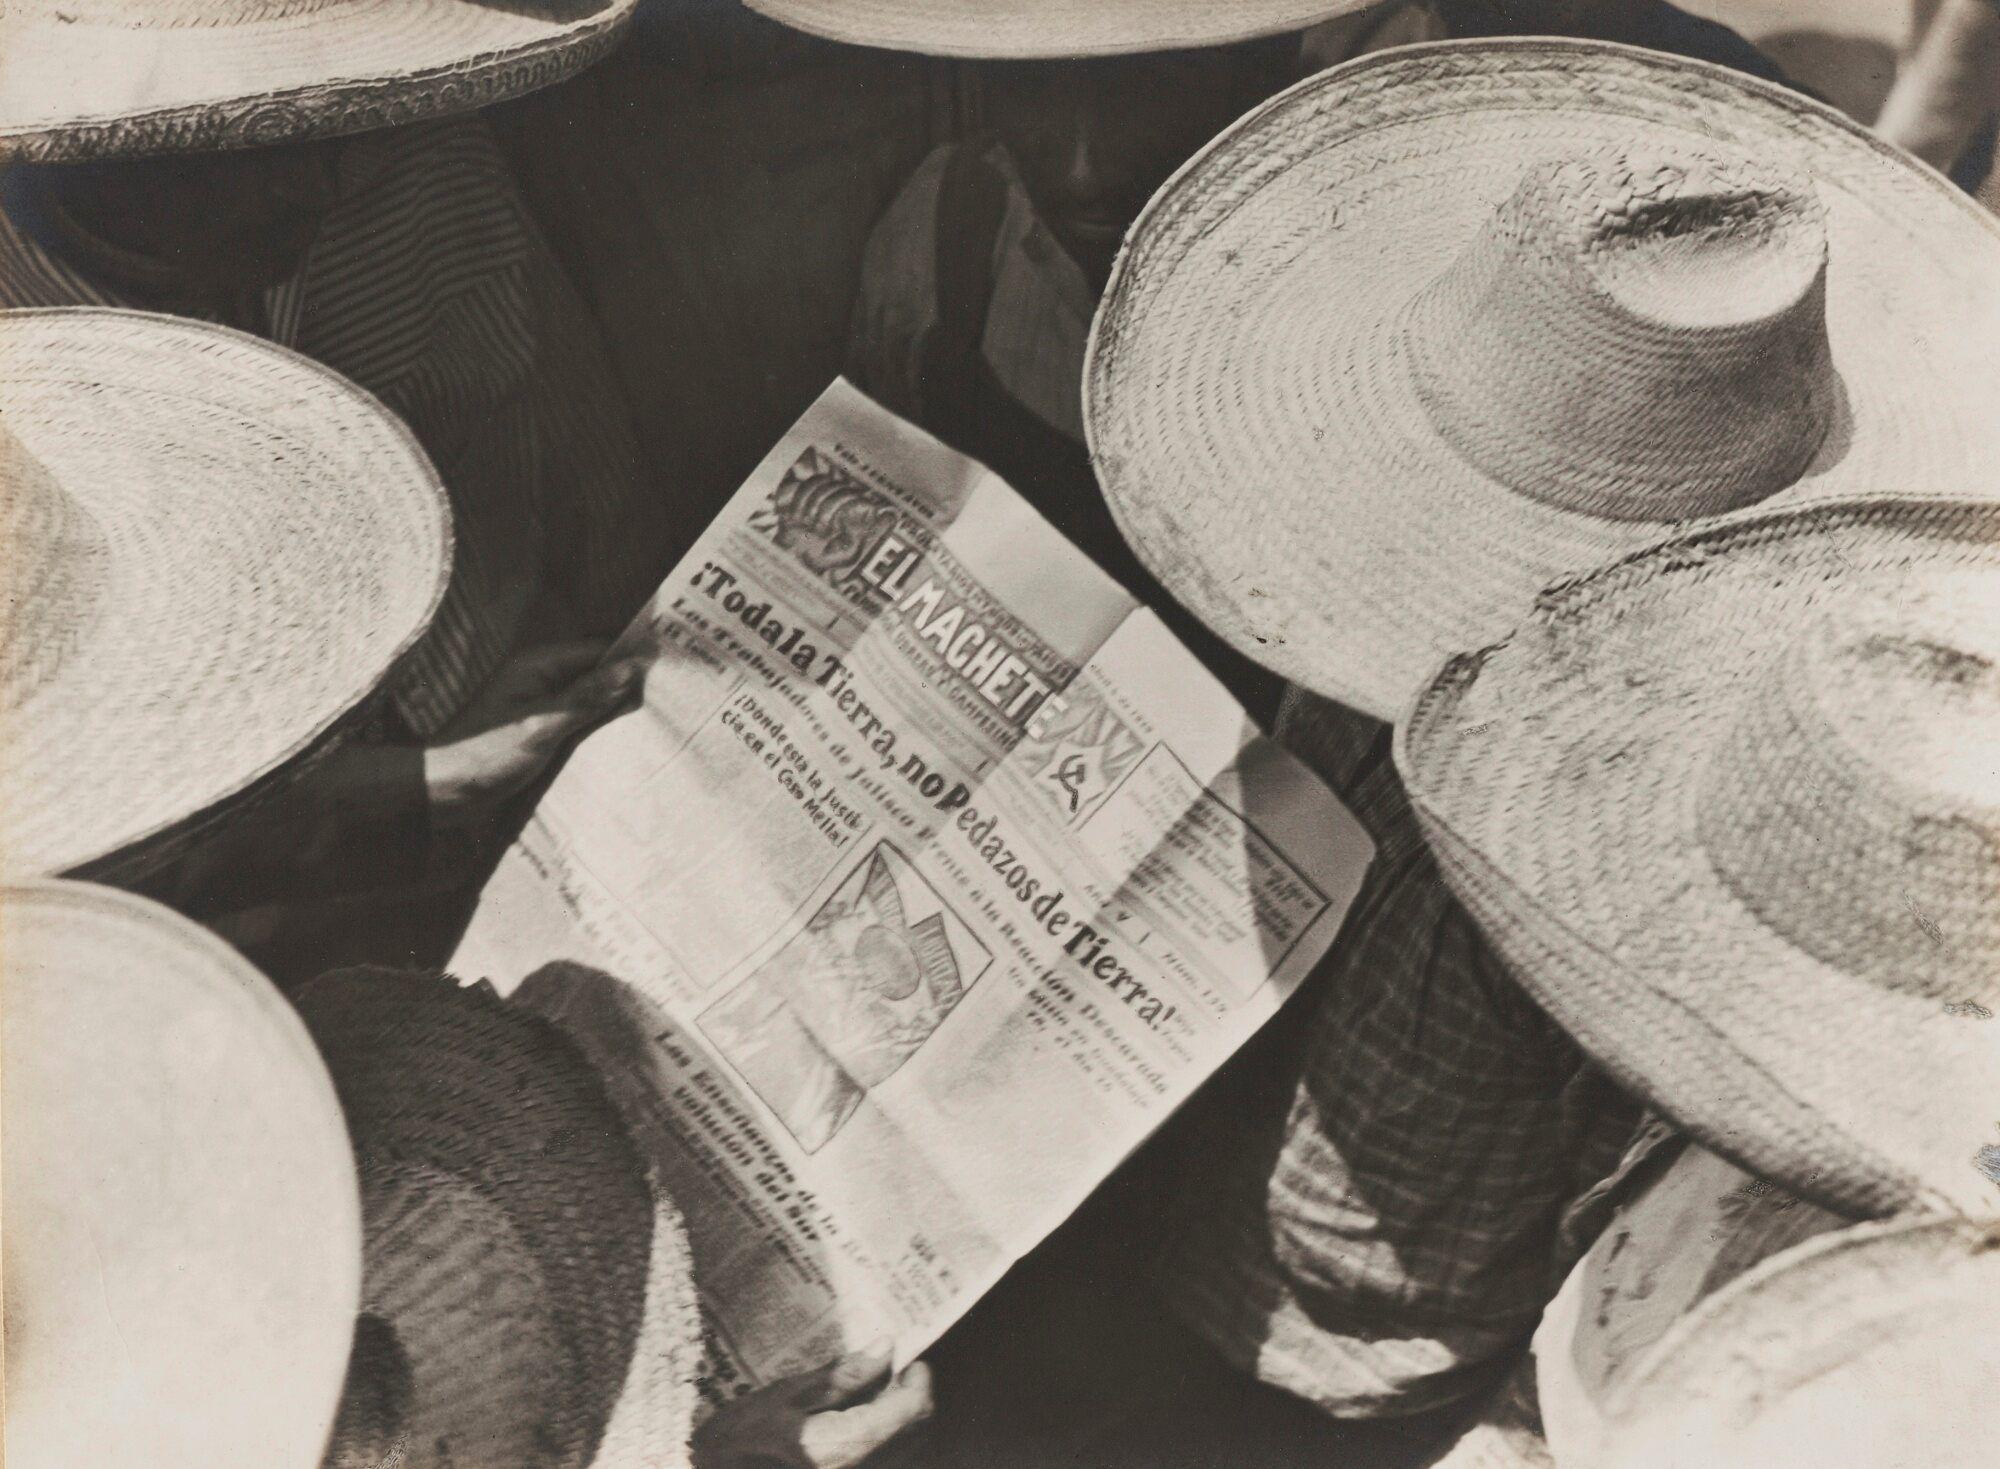 (fig.2: Campesinos Reading El Machete, 1929, taken by Tina Modotti)